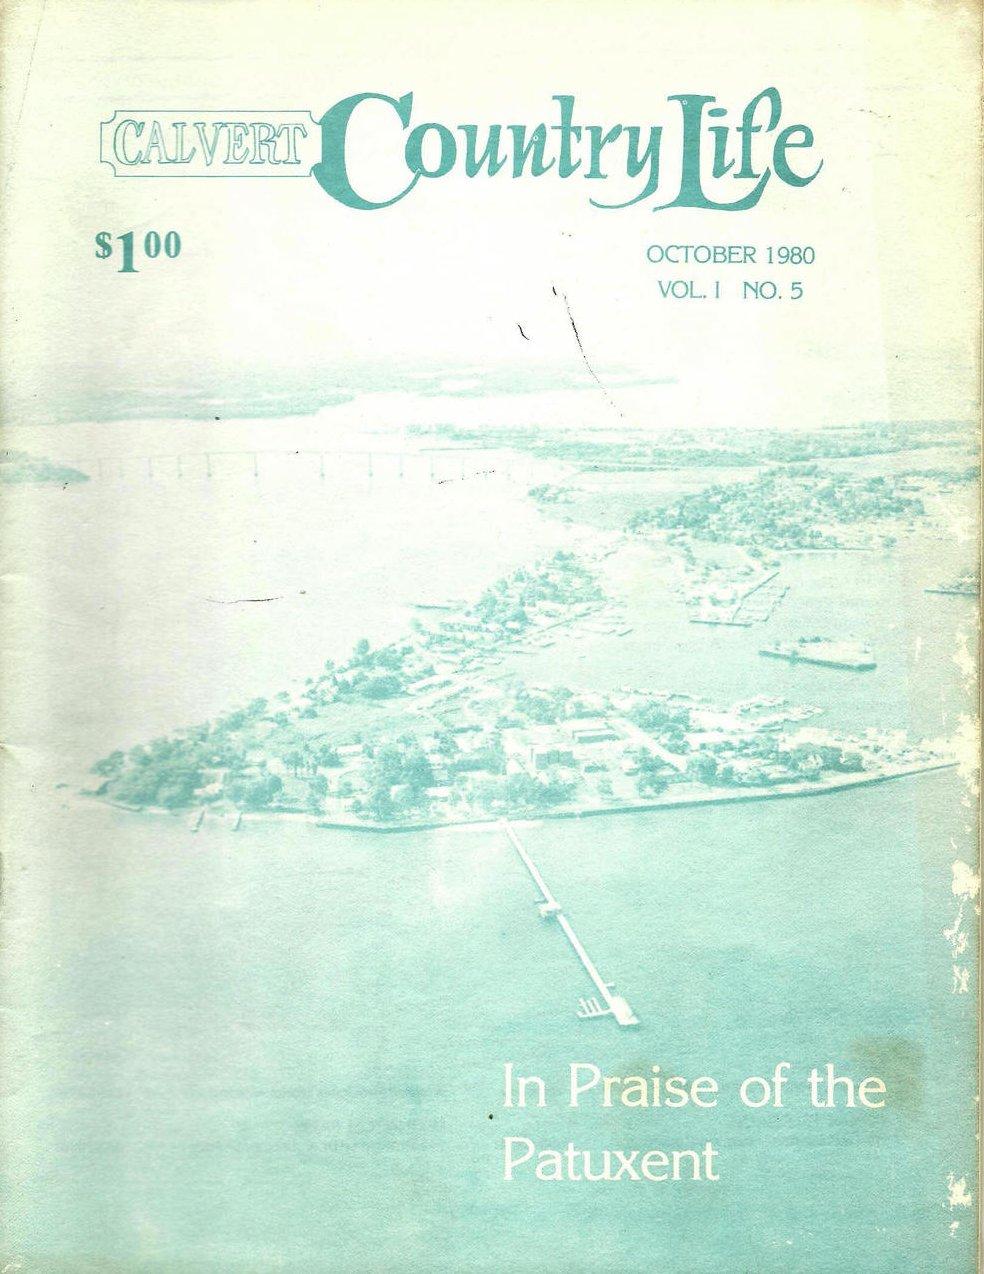 Calvert Country Life Vol 1 No 5 October 1980 Vintage Magazine